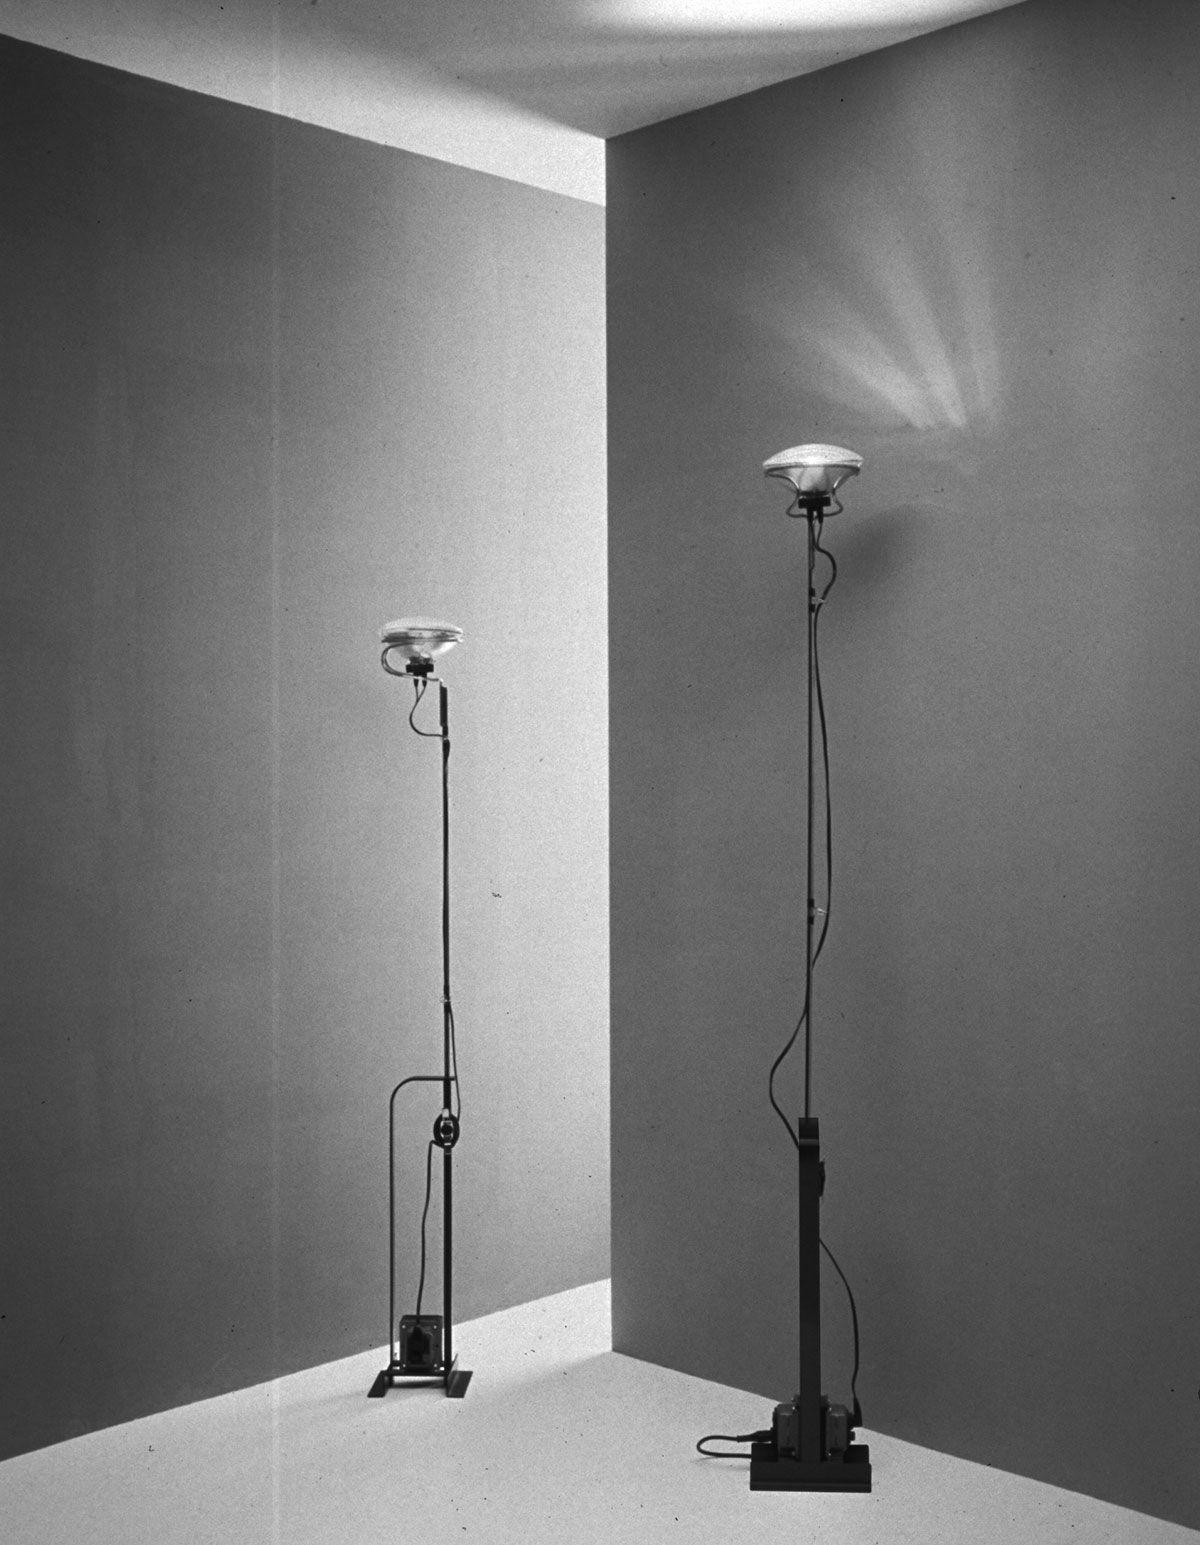 Decorative Modern Lighting For Contemporary Spaces Flos Usa Modern Floor Lamp Design Floor Lamp Design Lamp